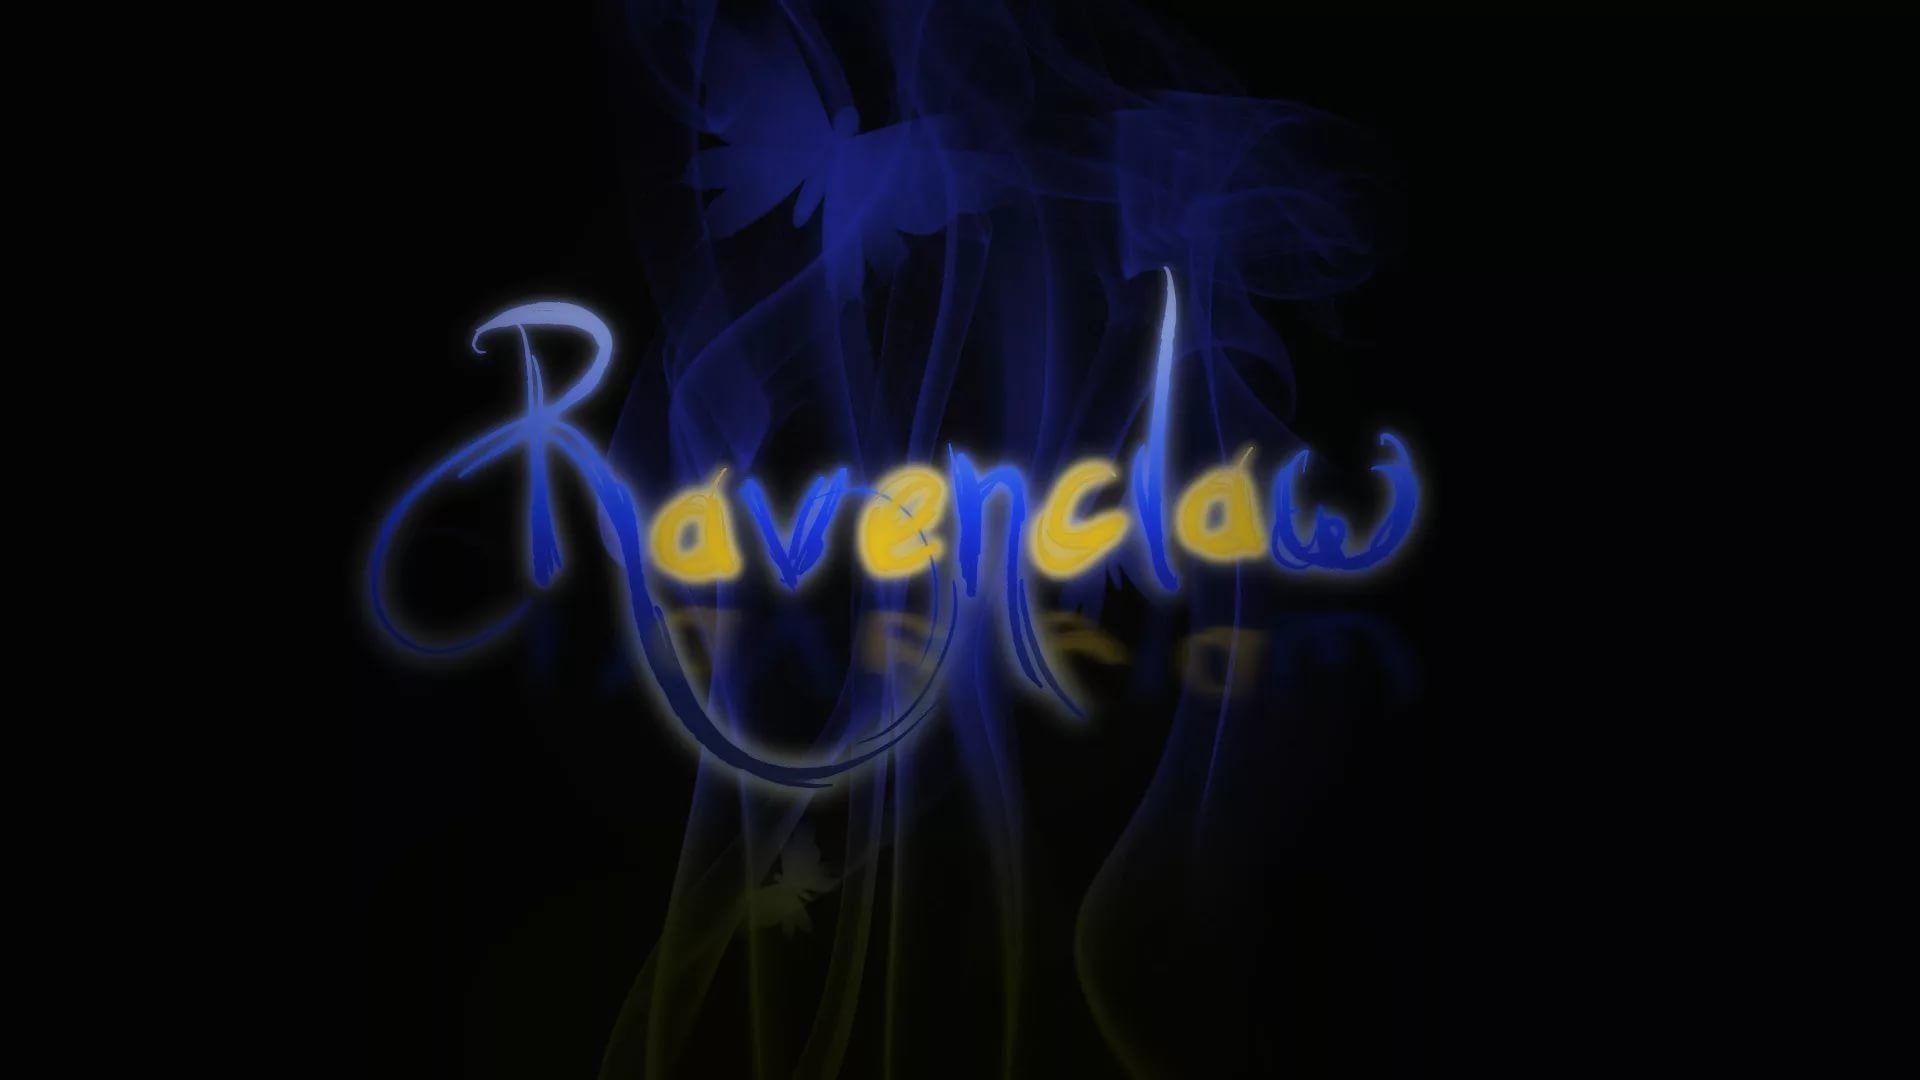 Ravenclaw computer wallpaper